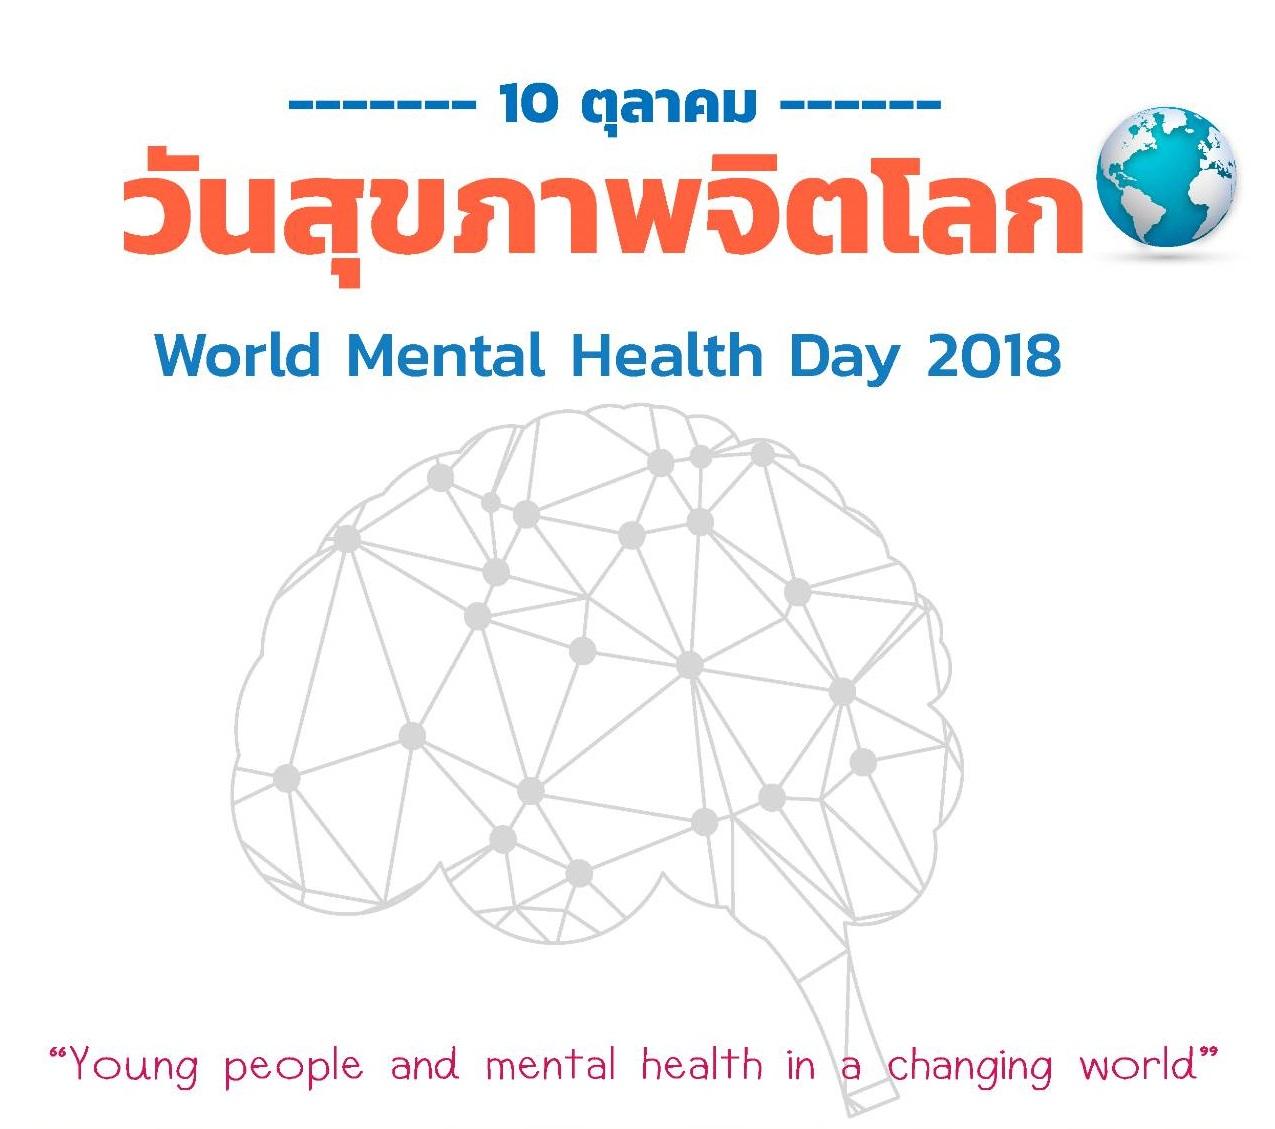 world-mental-health-day-10-october-2018